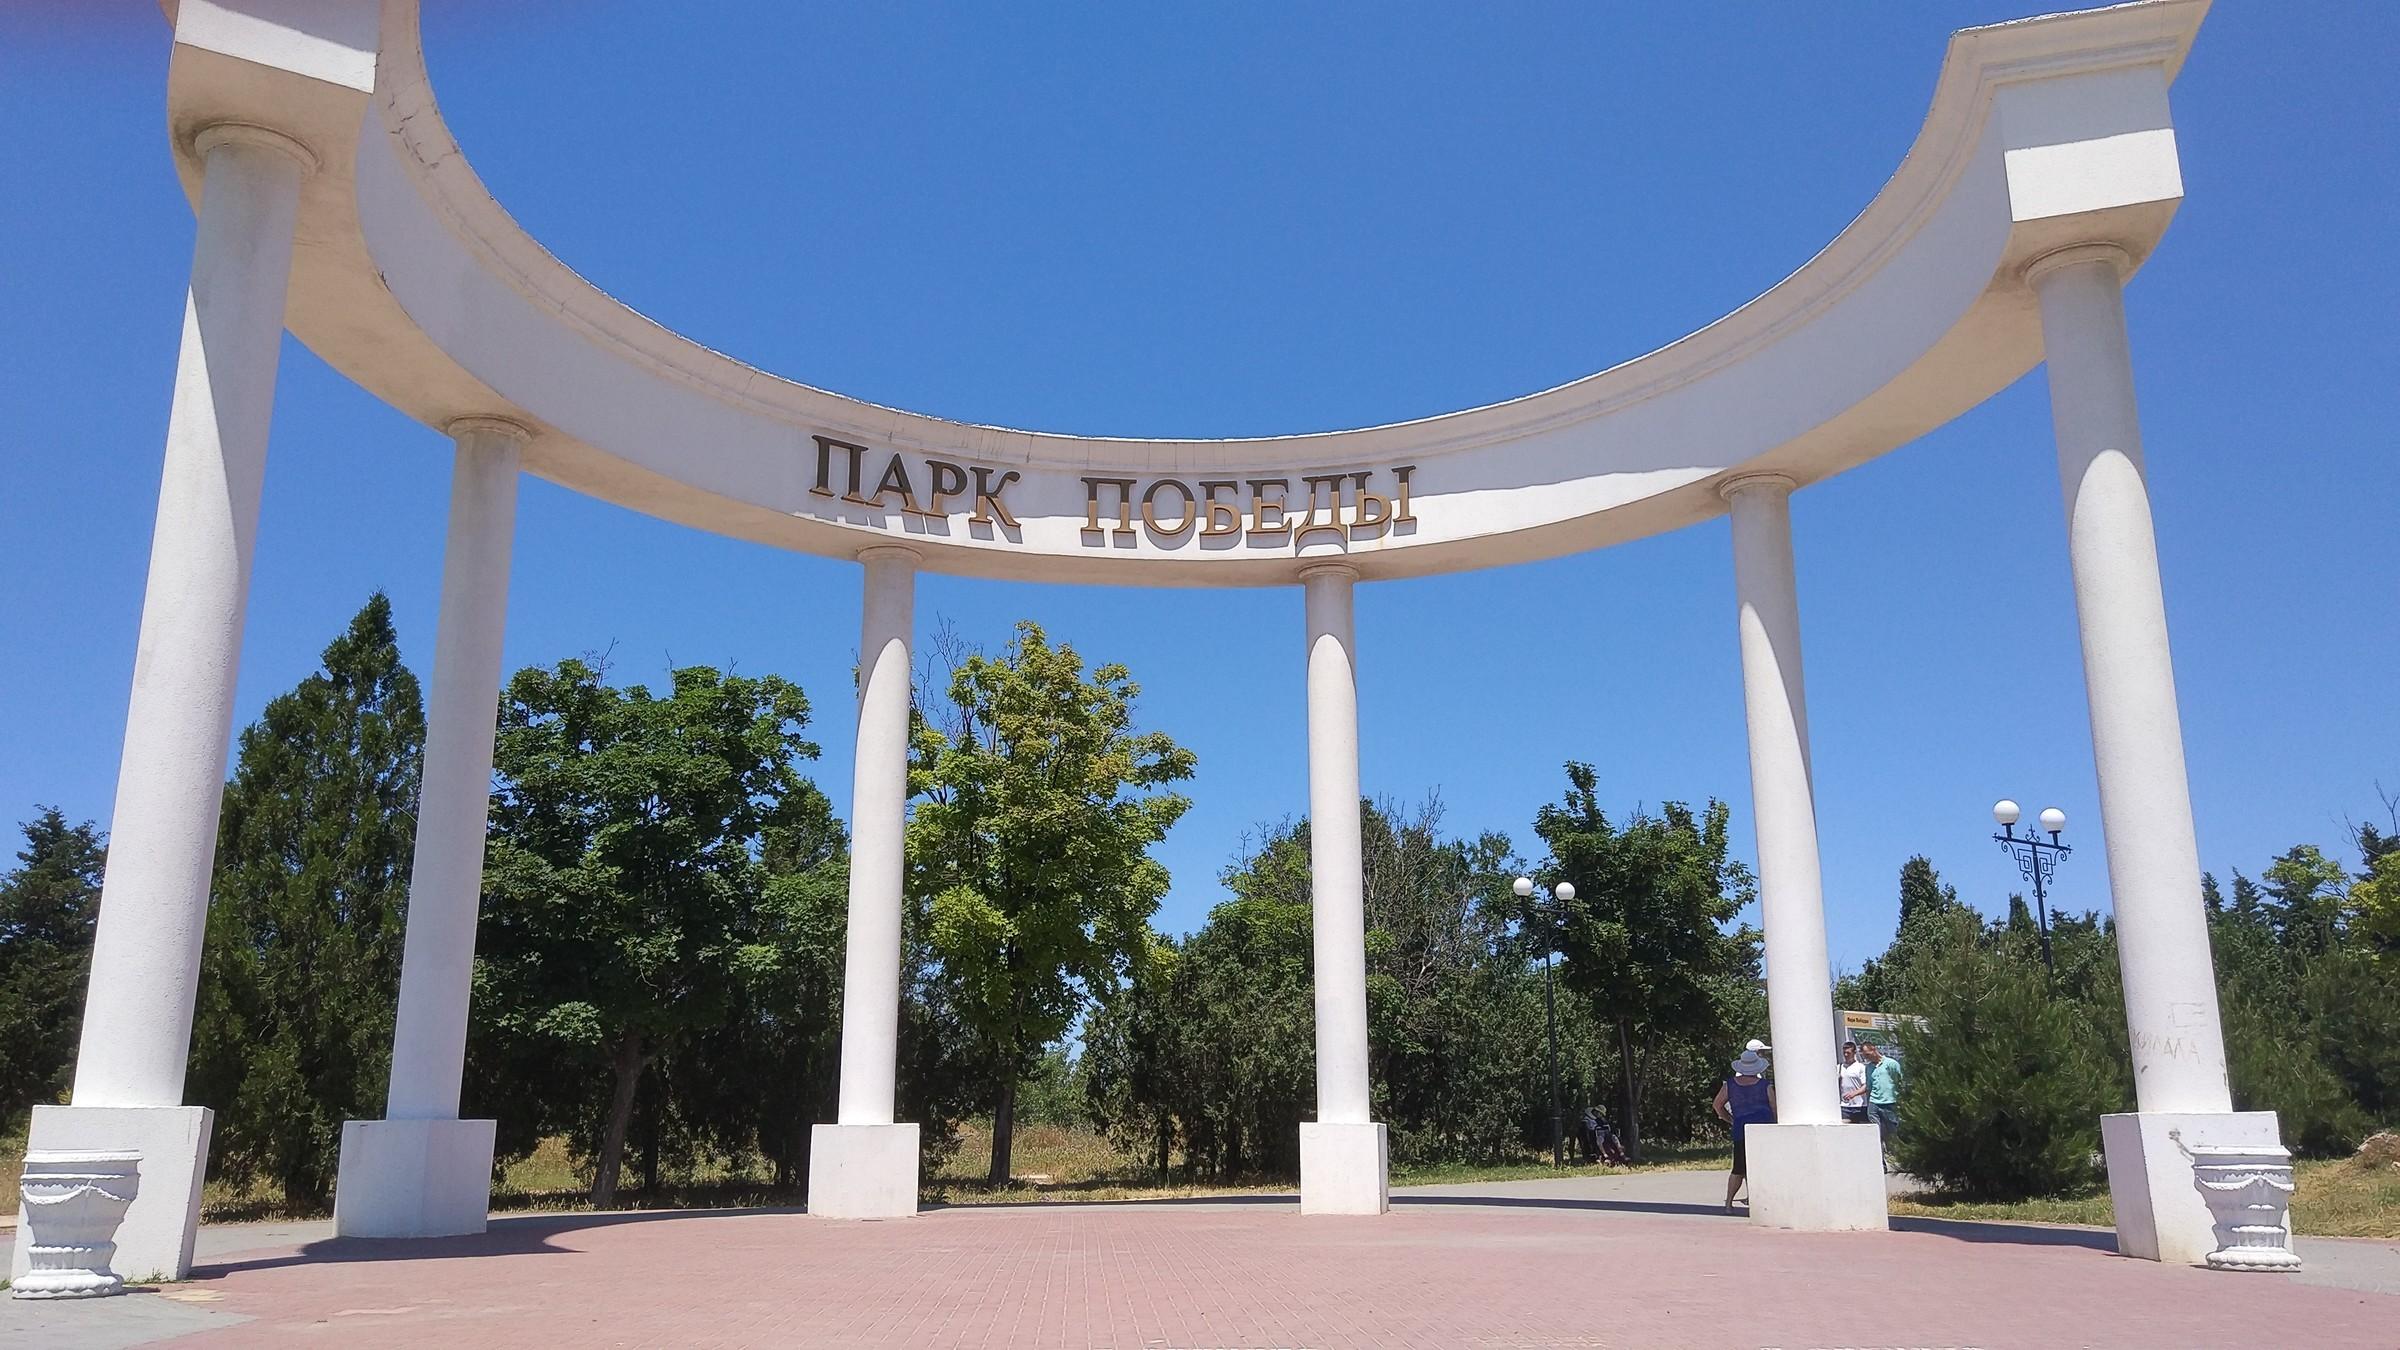 парк победы севастополь картинка тюнинг году